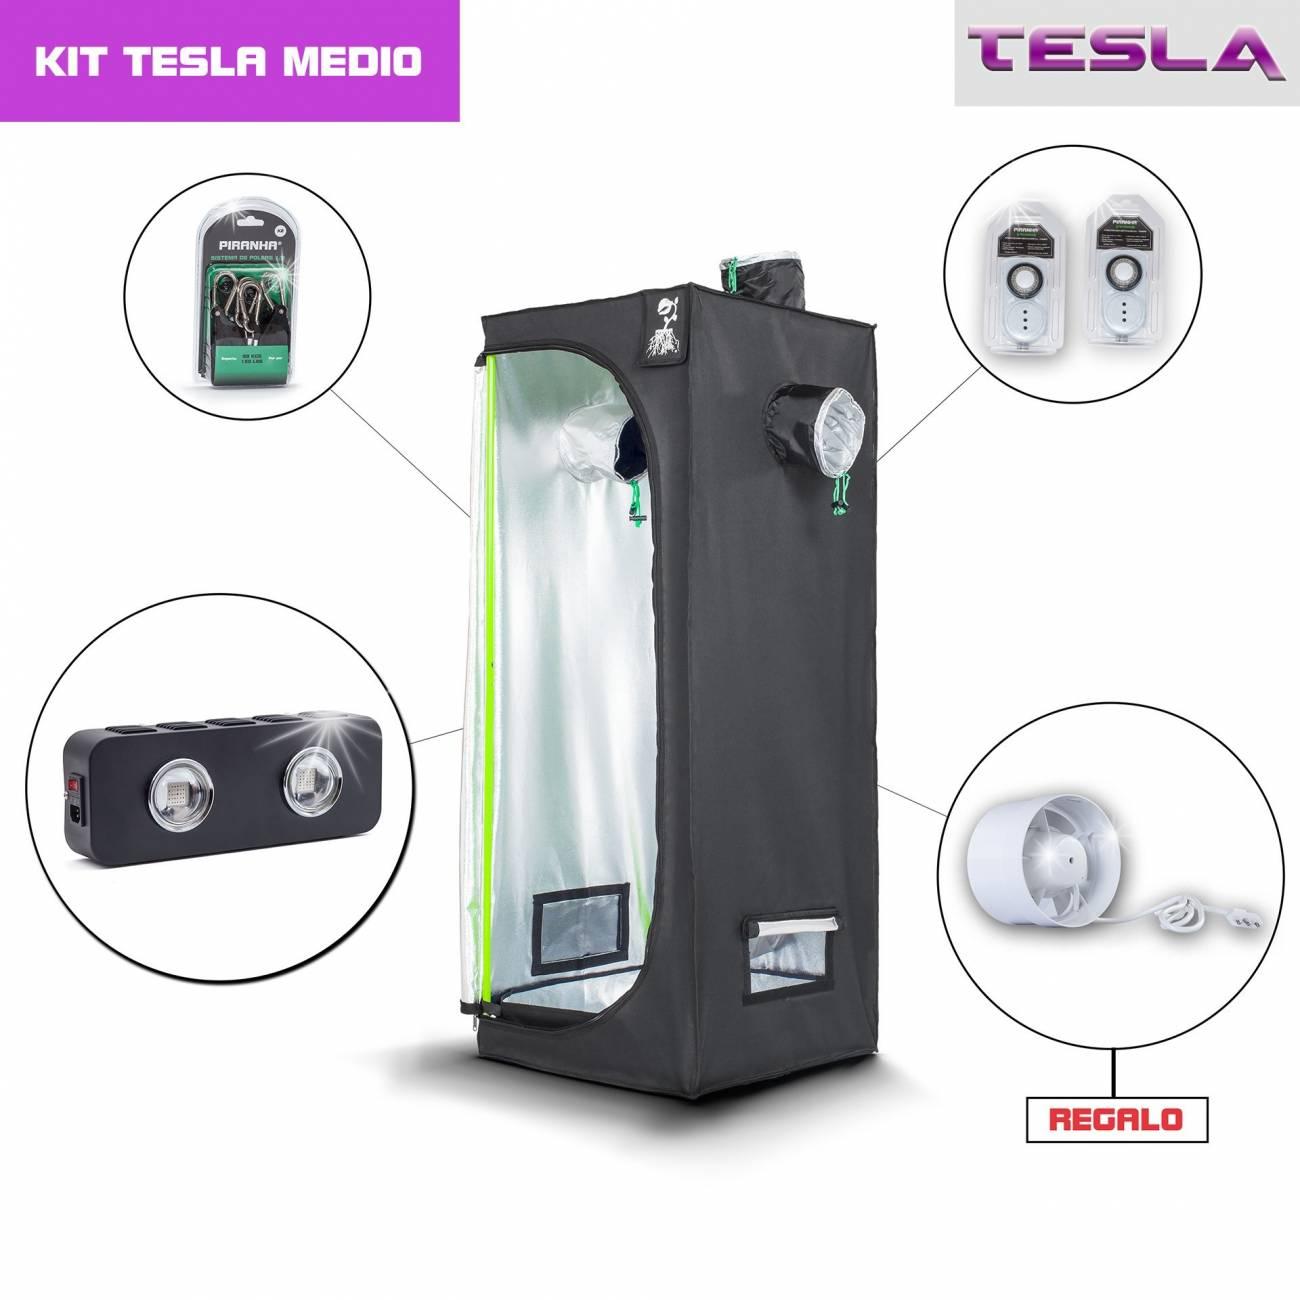 Kit Tesla 60 - T180W Medio